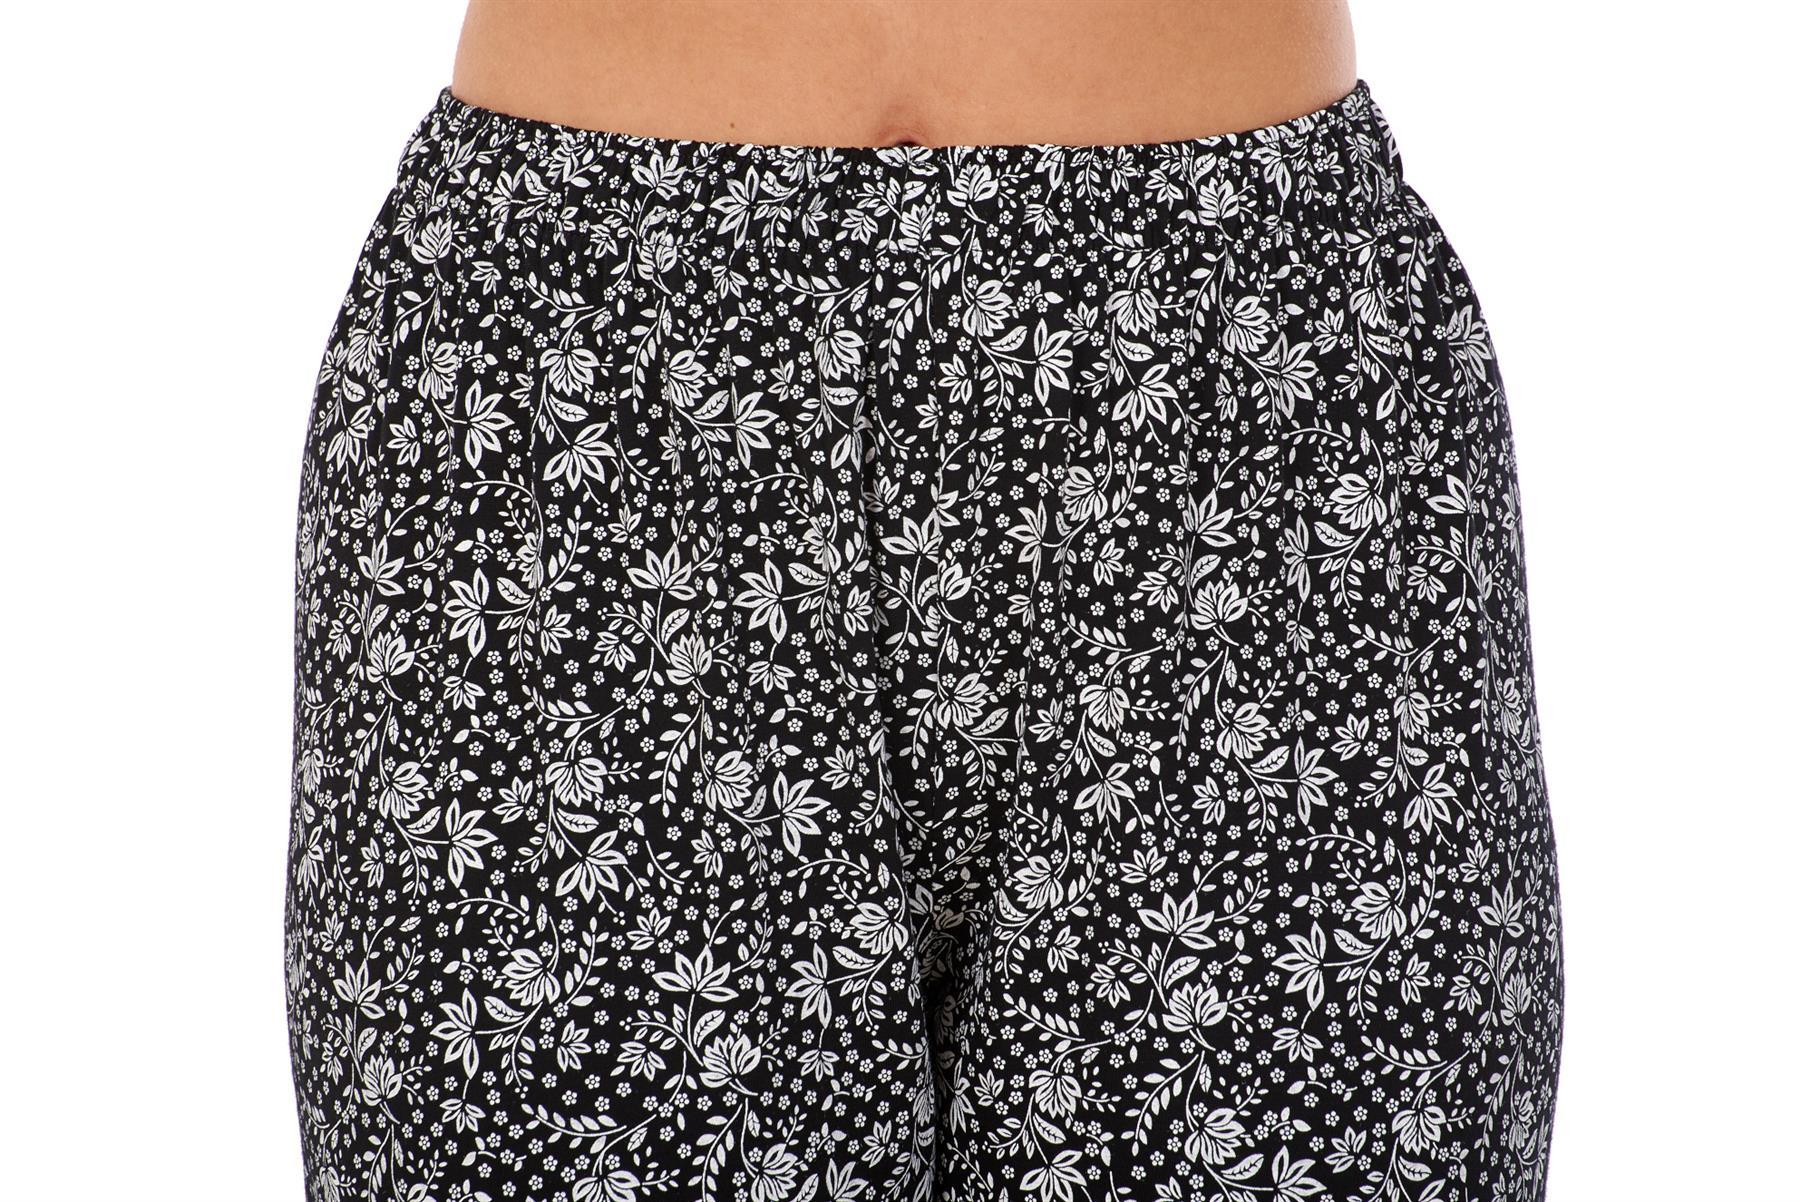 Ladies-Women-Trouser-Elasticated-Printed-Tapered-Harem-High-waist-Regular-Pants thumbnail 21